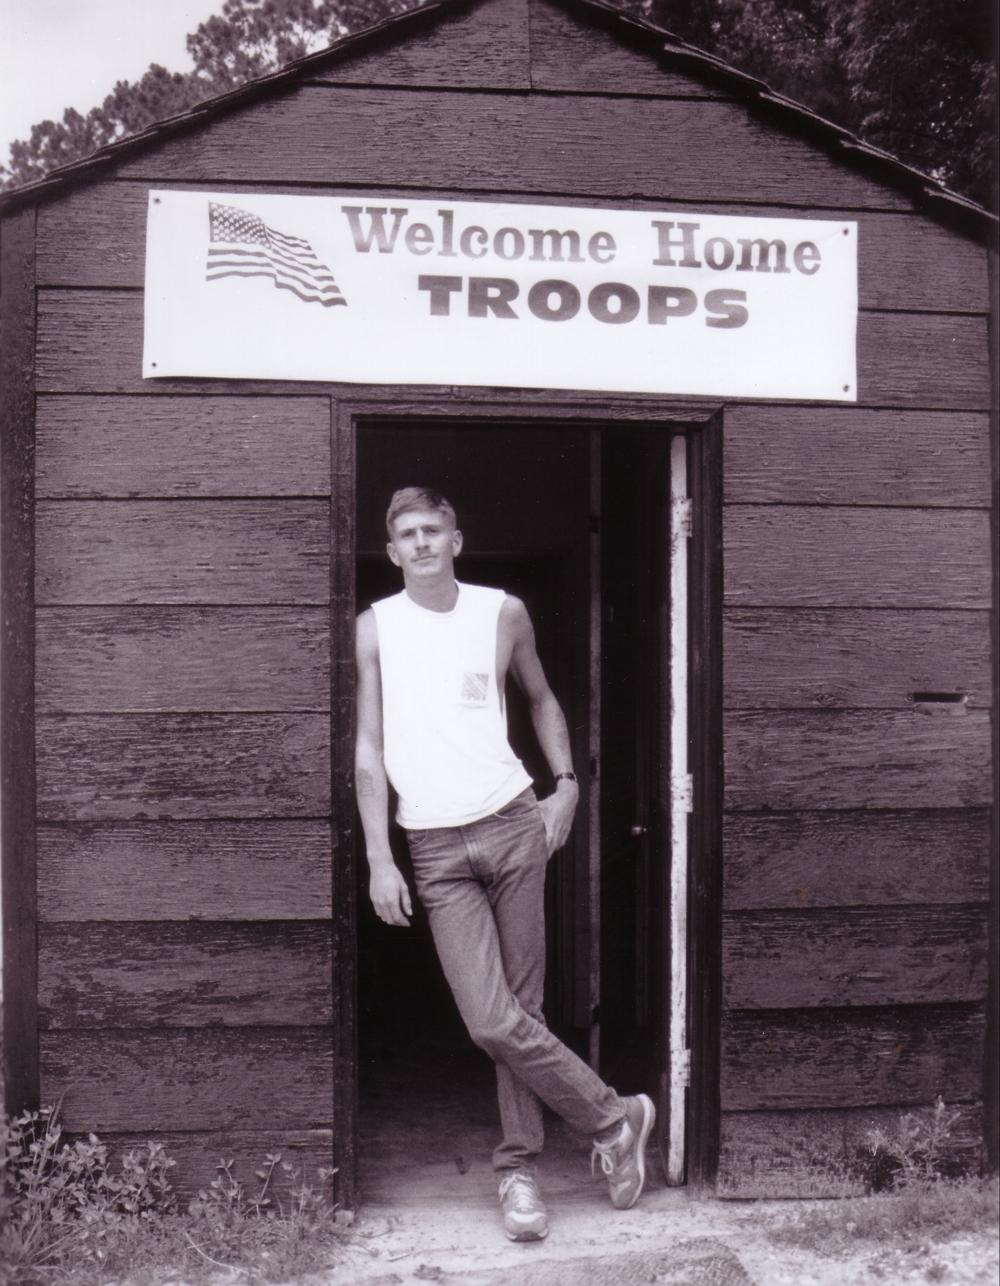 22 Corpoal Gary Hendricks USMC Camp Lejeune NC.jpg